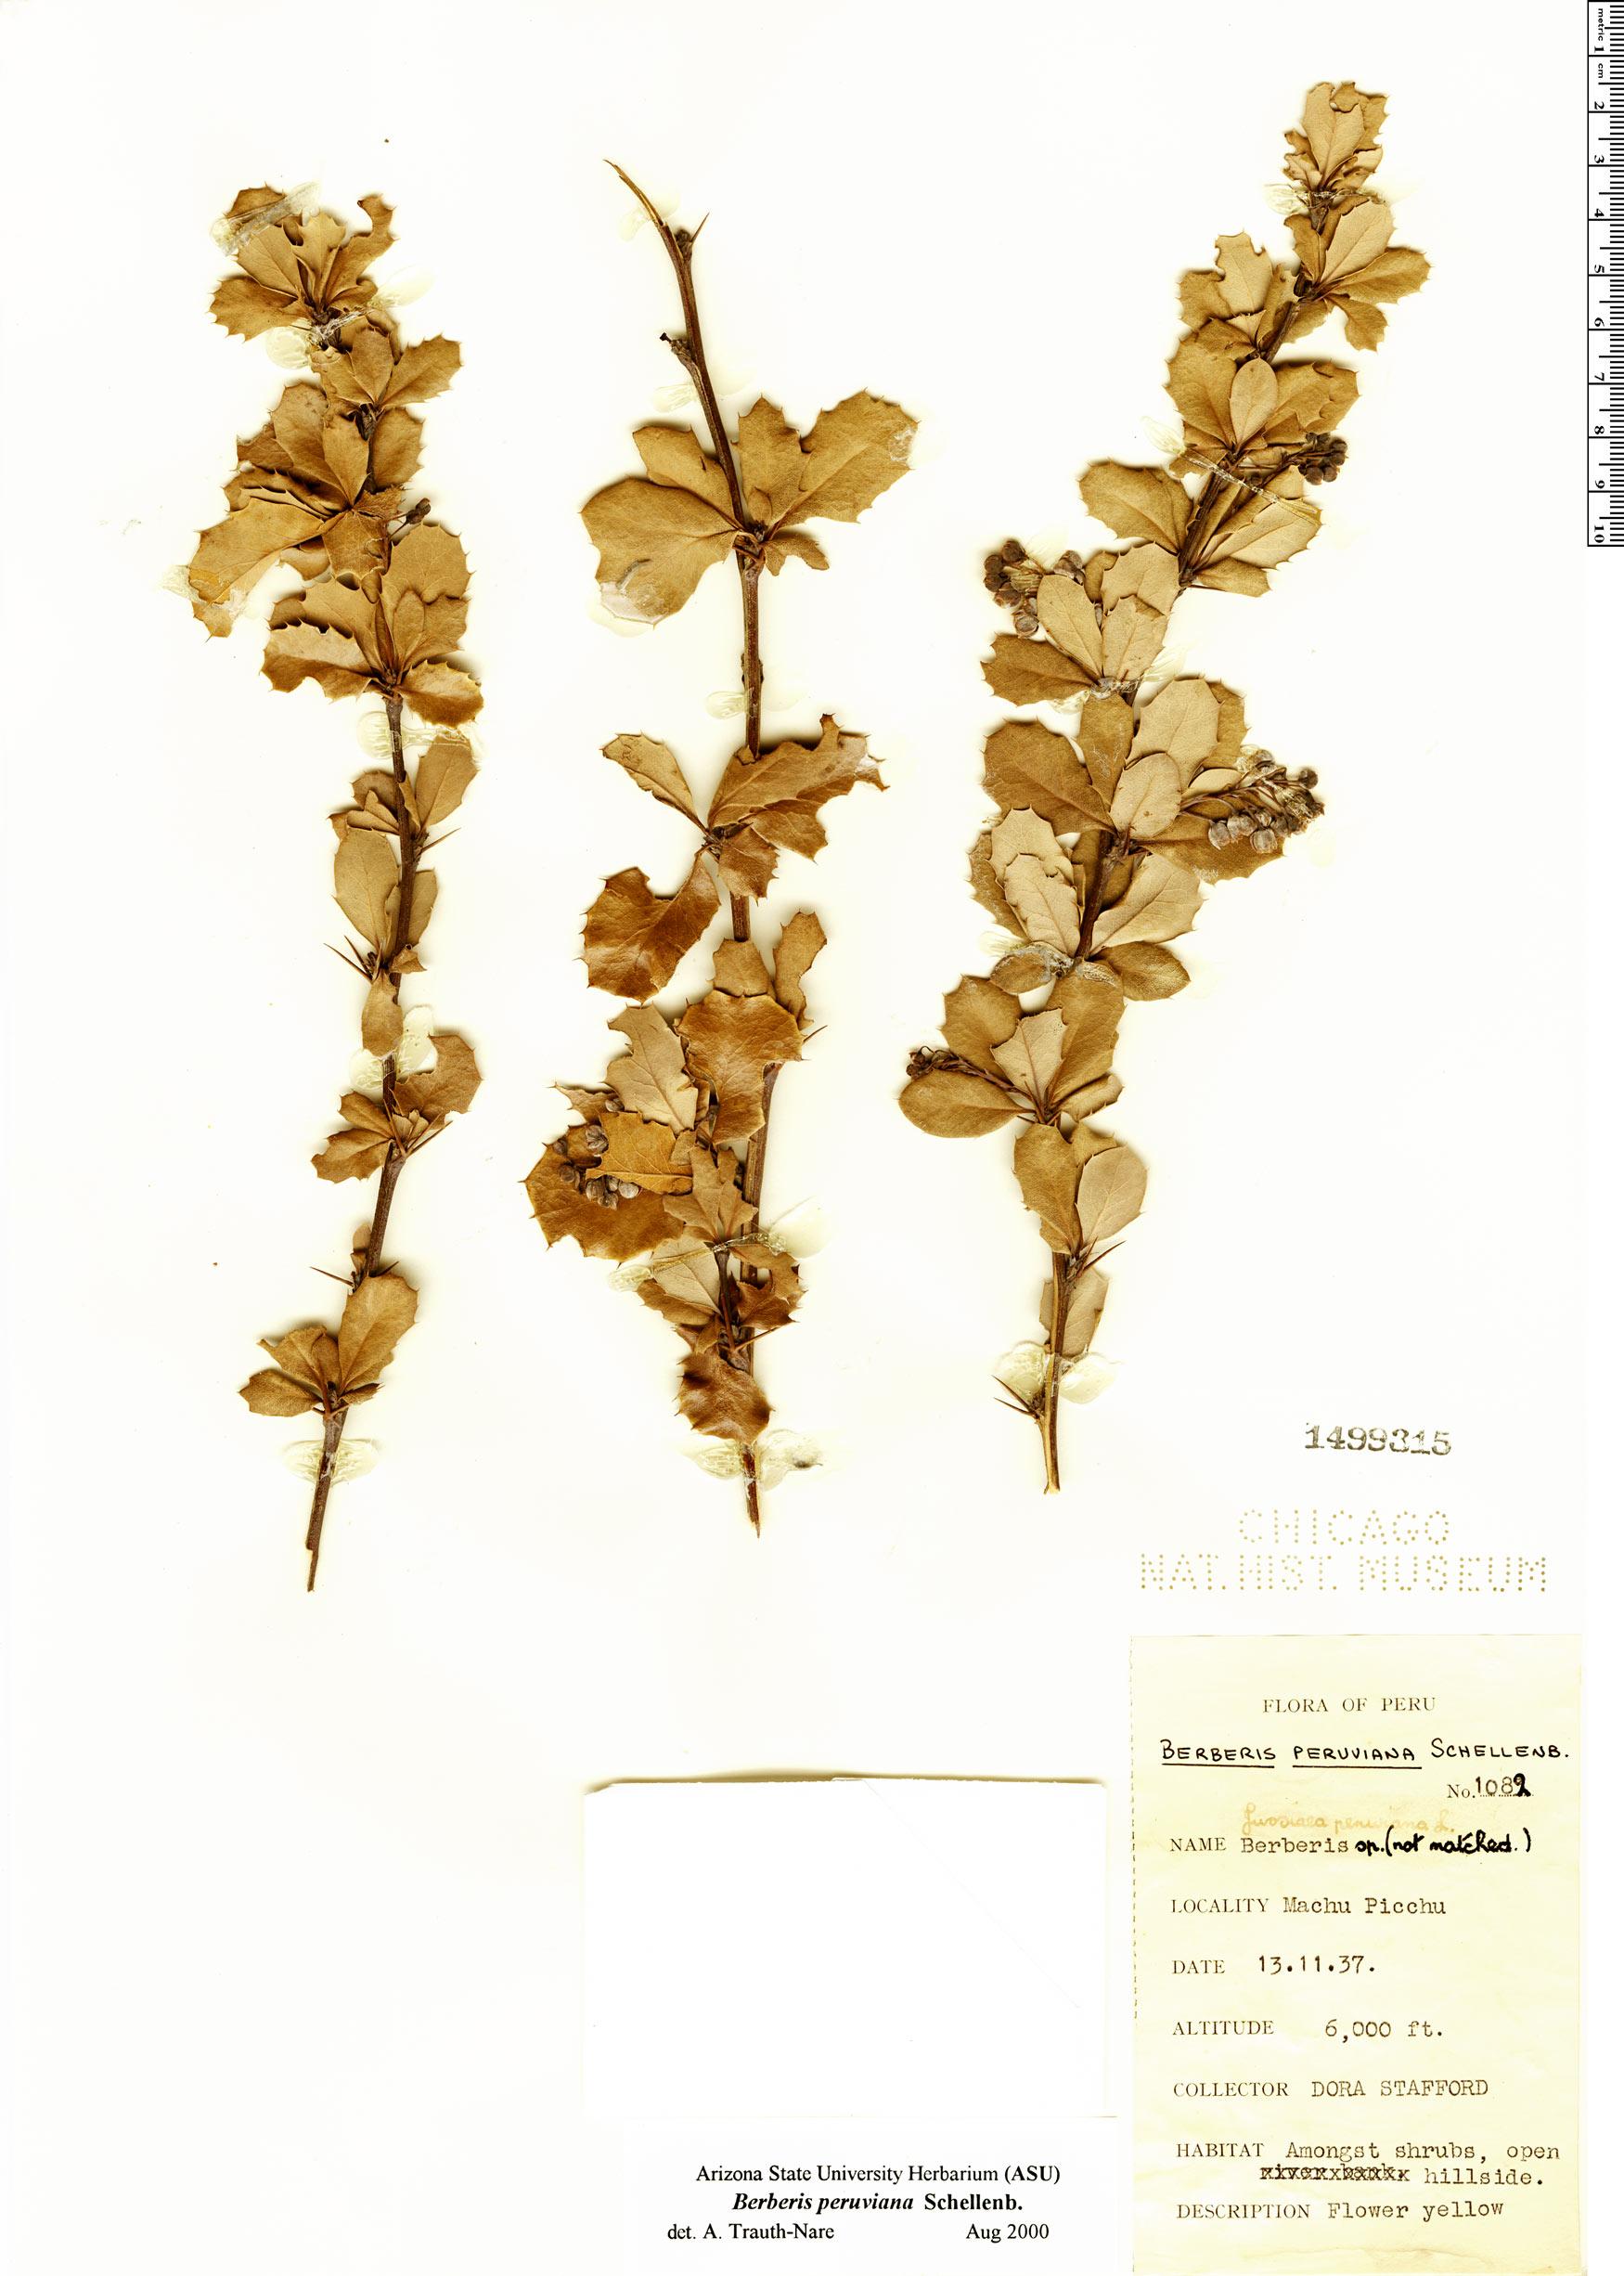 Specimen: Berberis peruviana